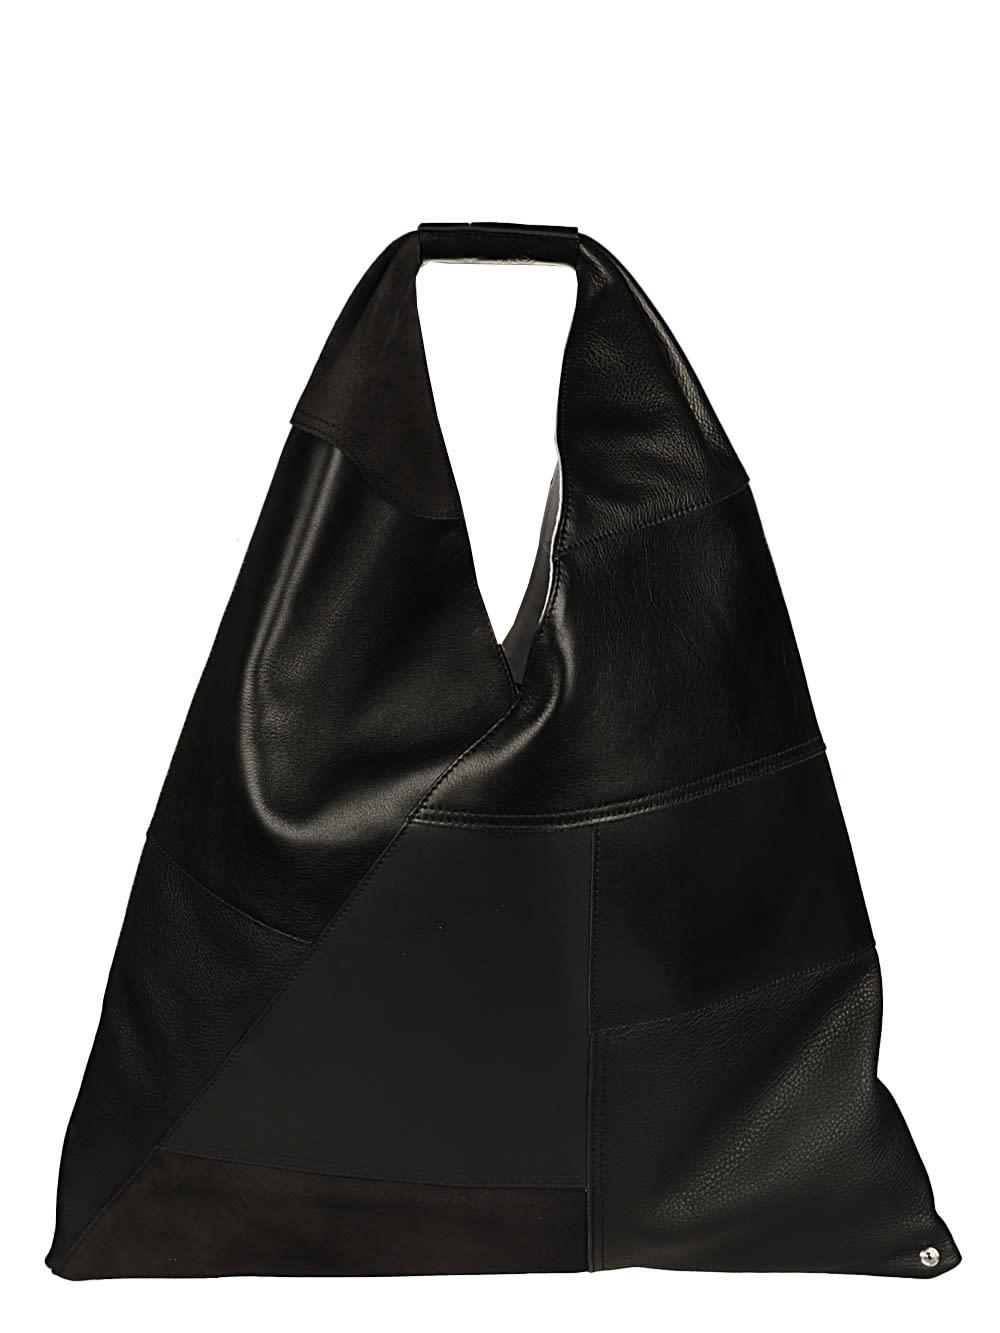 Mm6 Maison Margiela Leathers JAPANESE BAG CLASSIC PATCHWORK MIX LEATHER BLACK